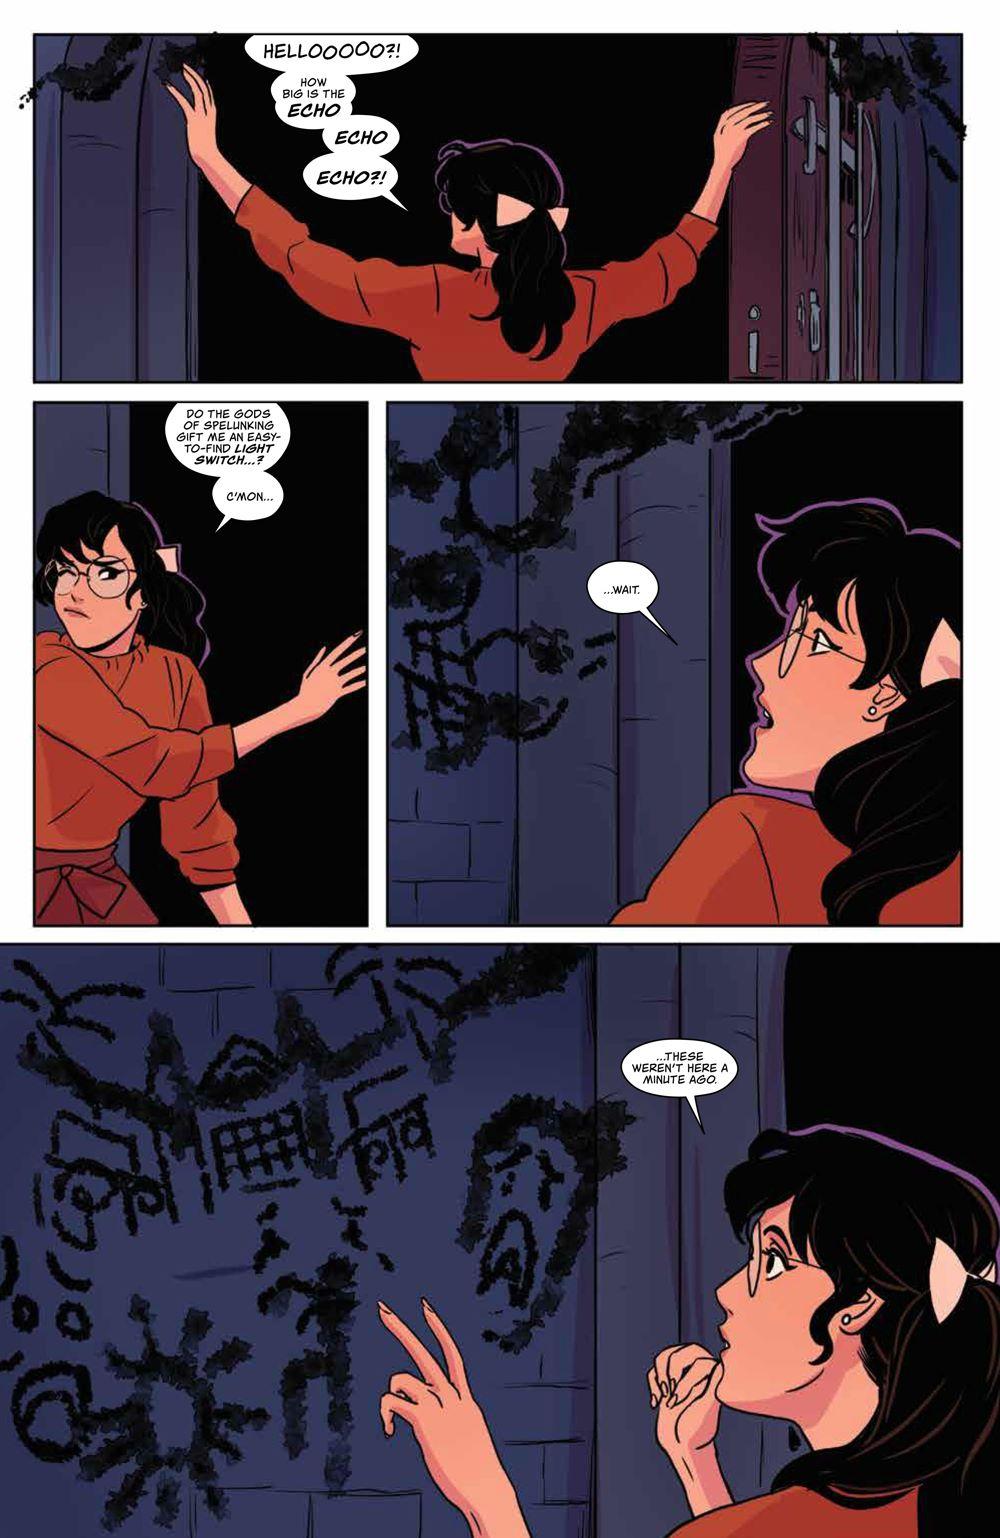 GhostedInLA_v3_SC_PRESS_19 ComicList Previews: GHOSTED IN L.A. VOLUME 3 TP